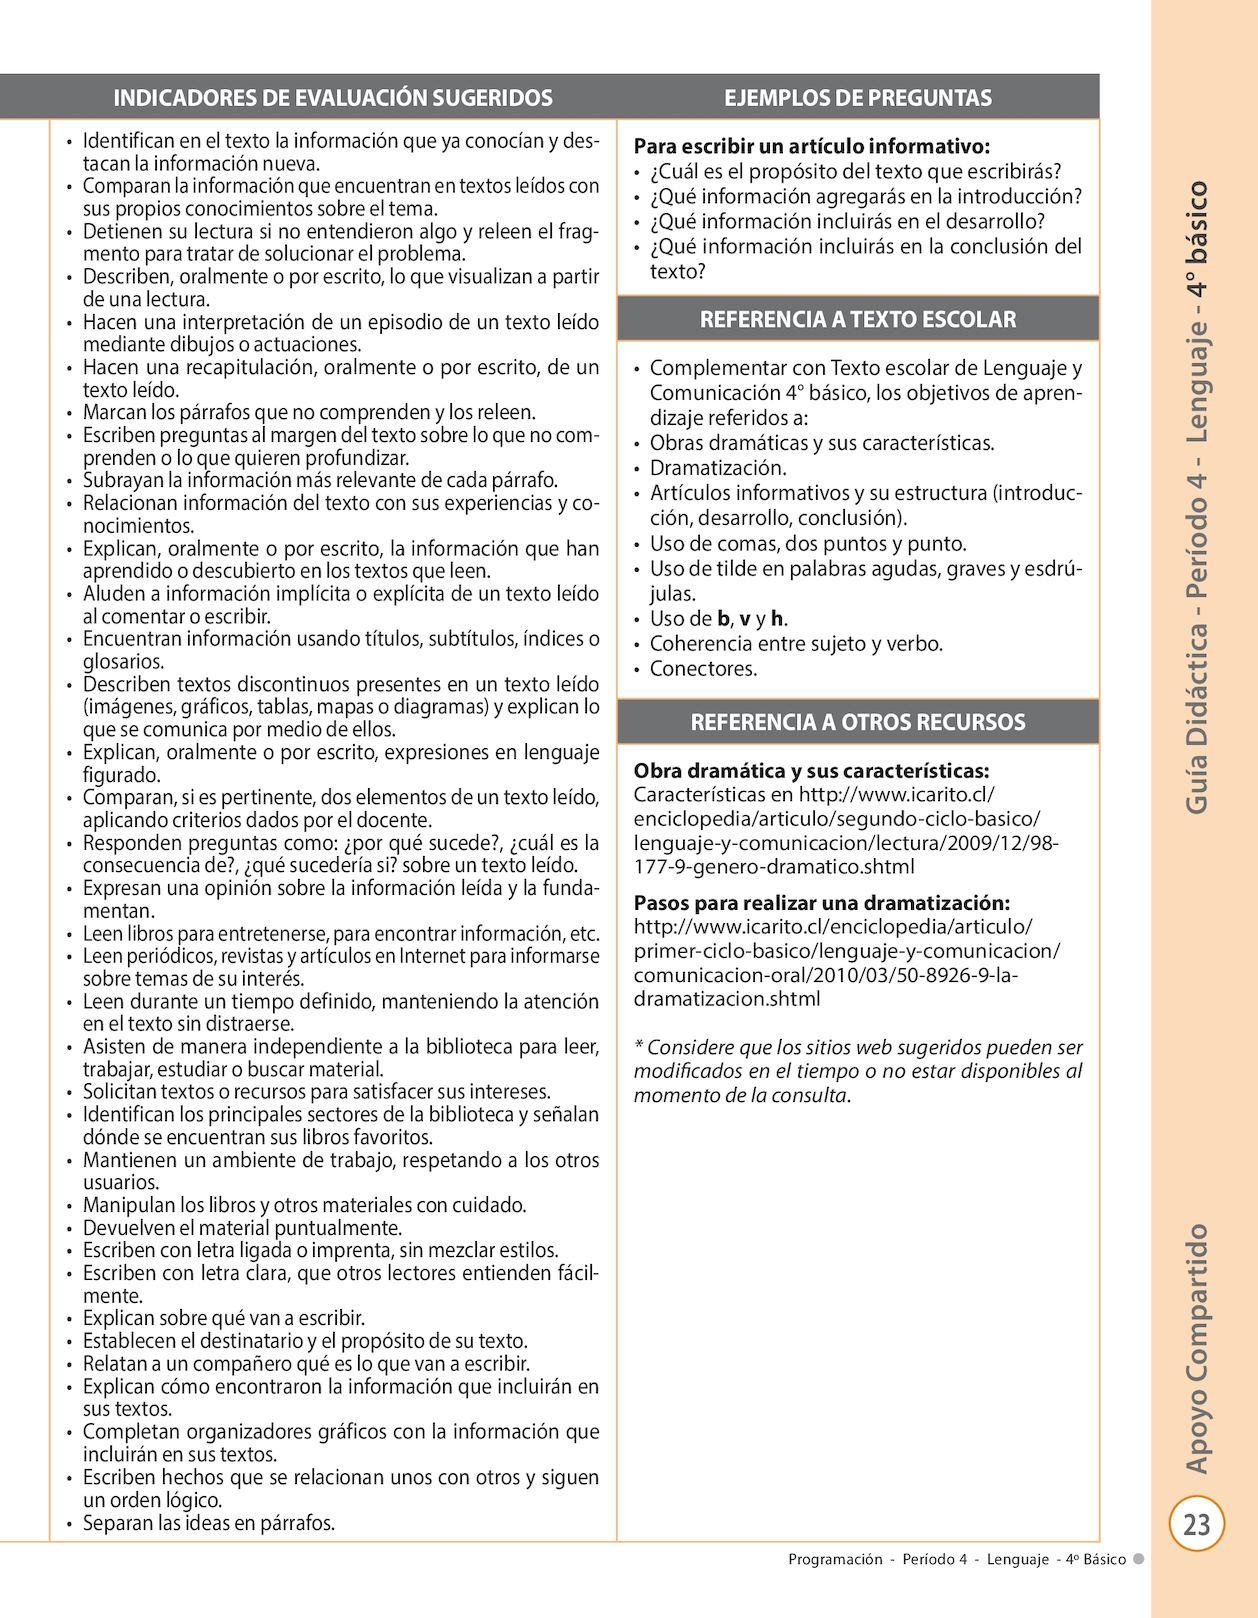 Guia Didactica 4basico Calameo Downloader